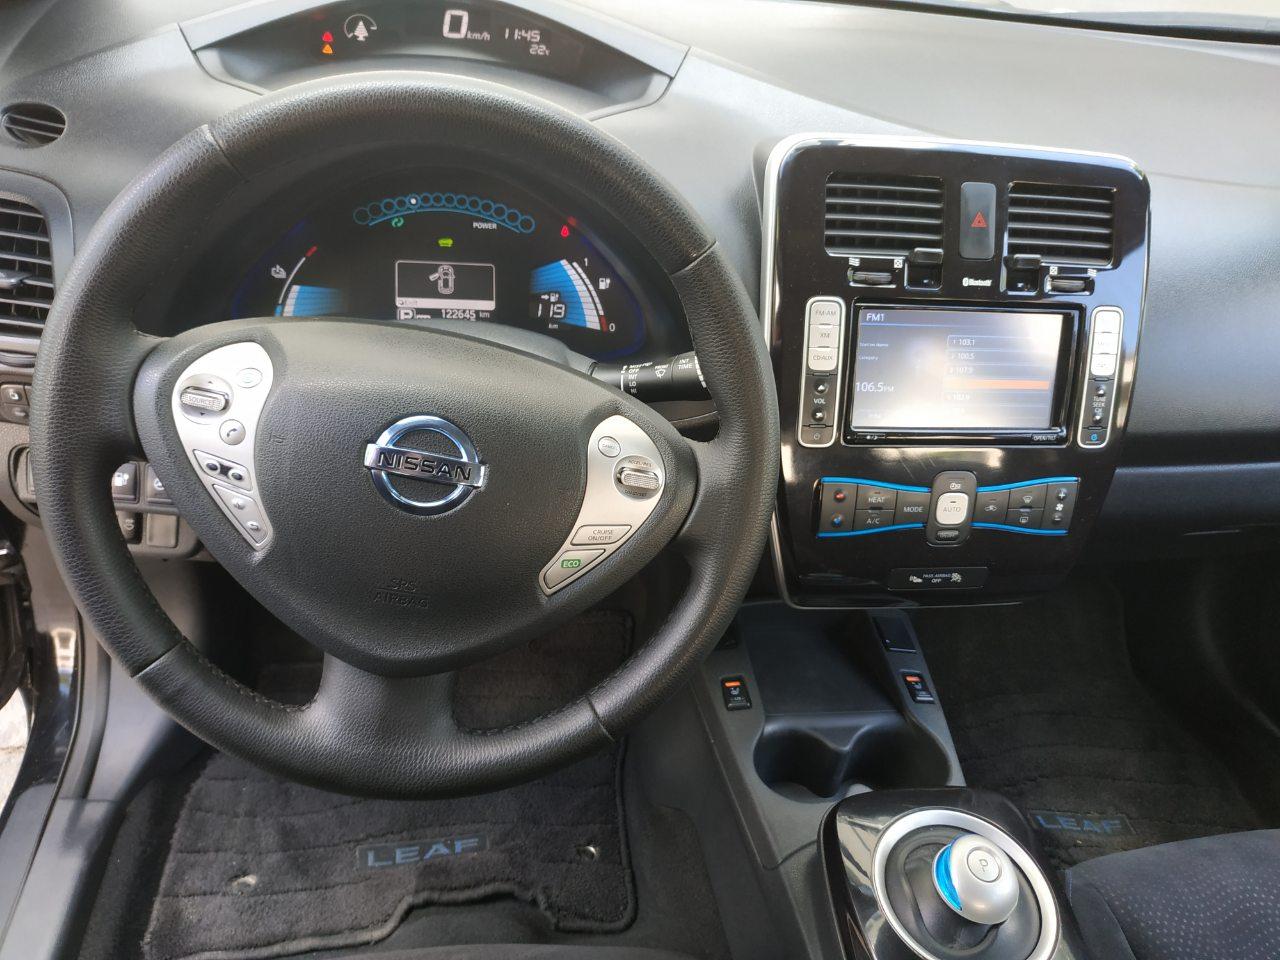 http://autocredit.com.ua/electro-cars/uploads/3/19-02-20/1pOwO4_0u1ZdgzQ3P.jpeg